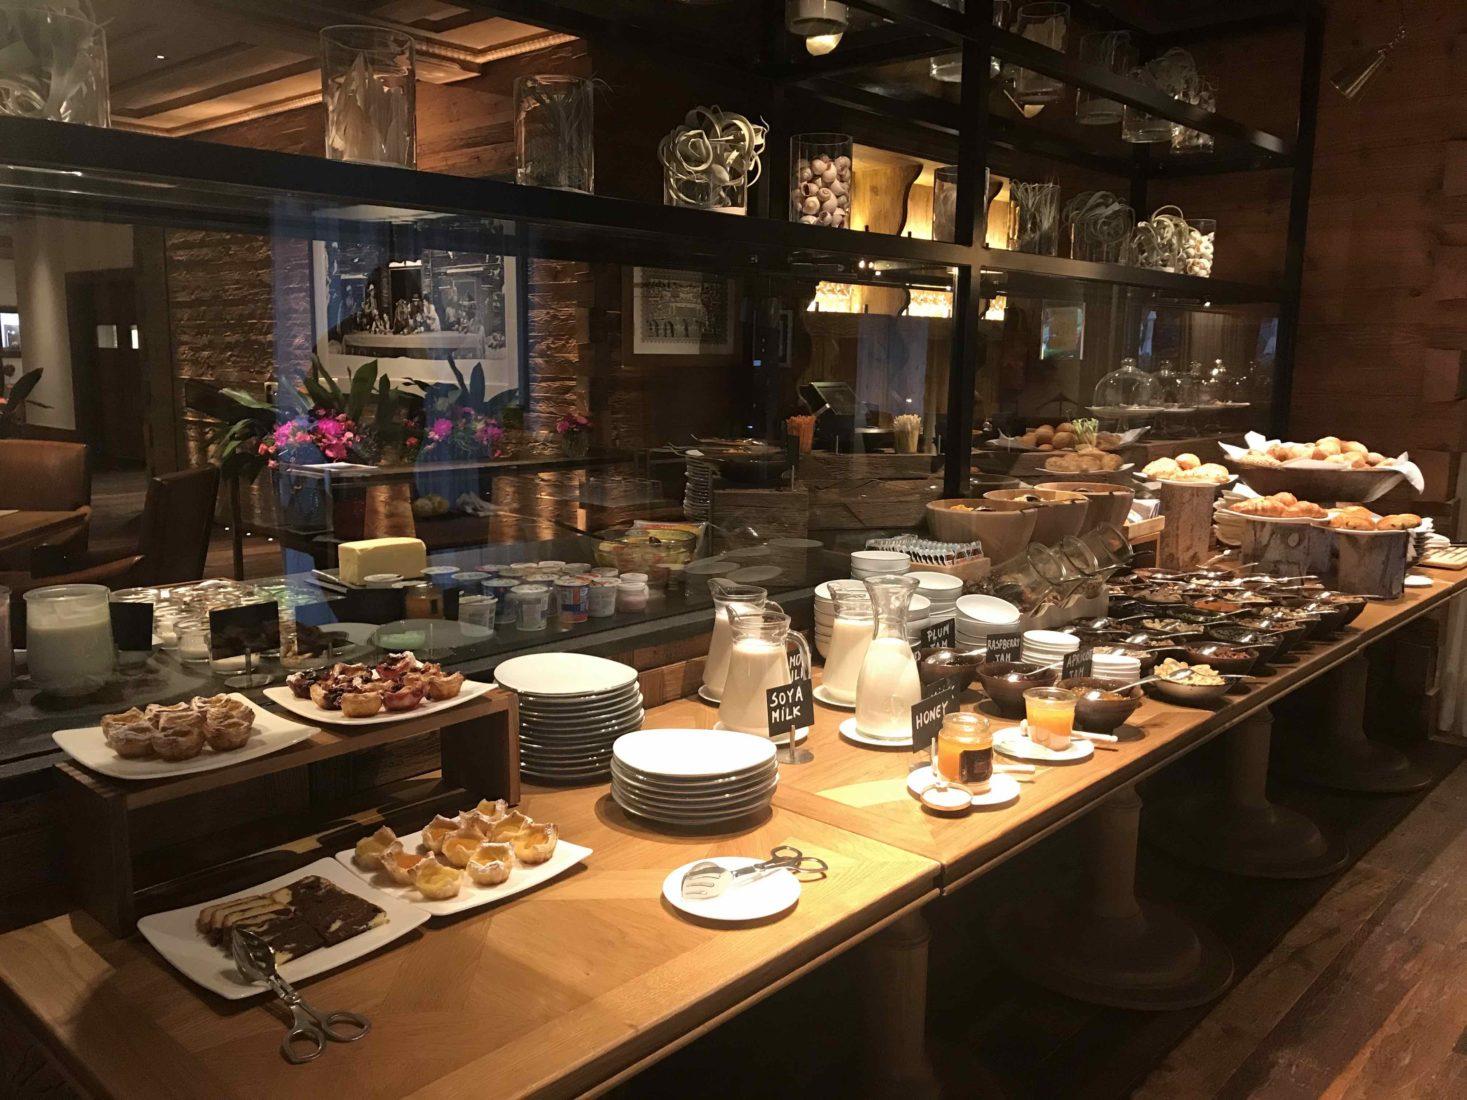 Hôtel Alpina Gstaad Suite petit déjeuner complet